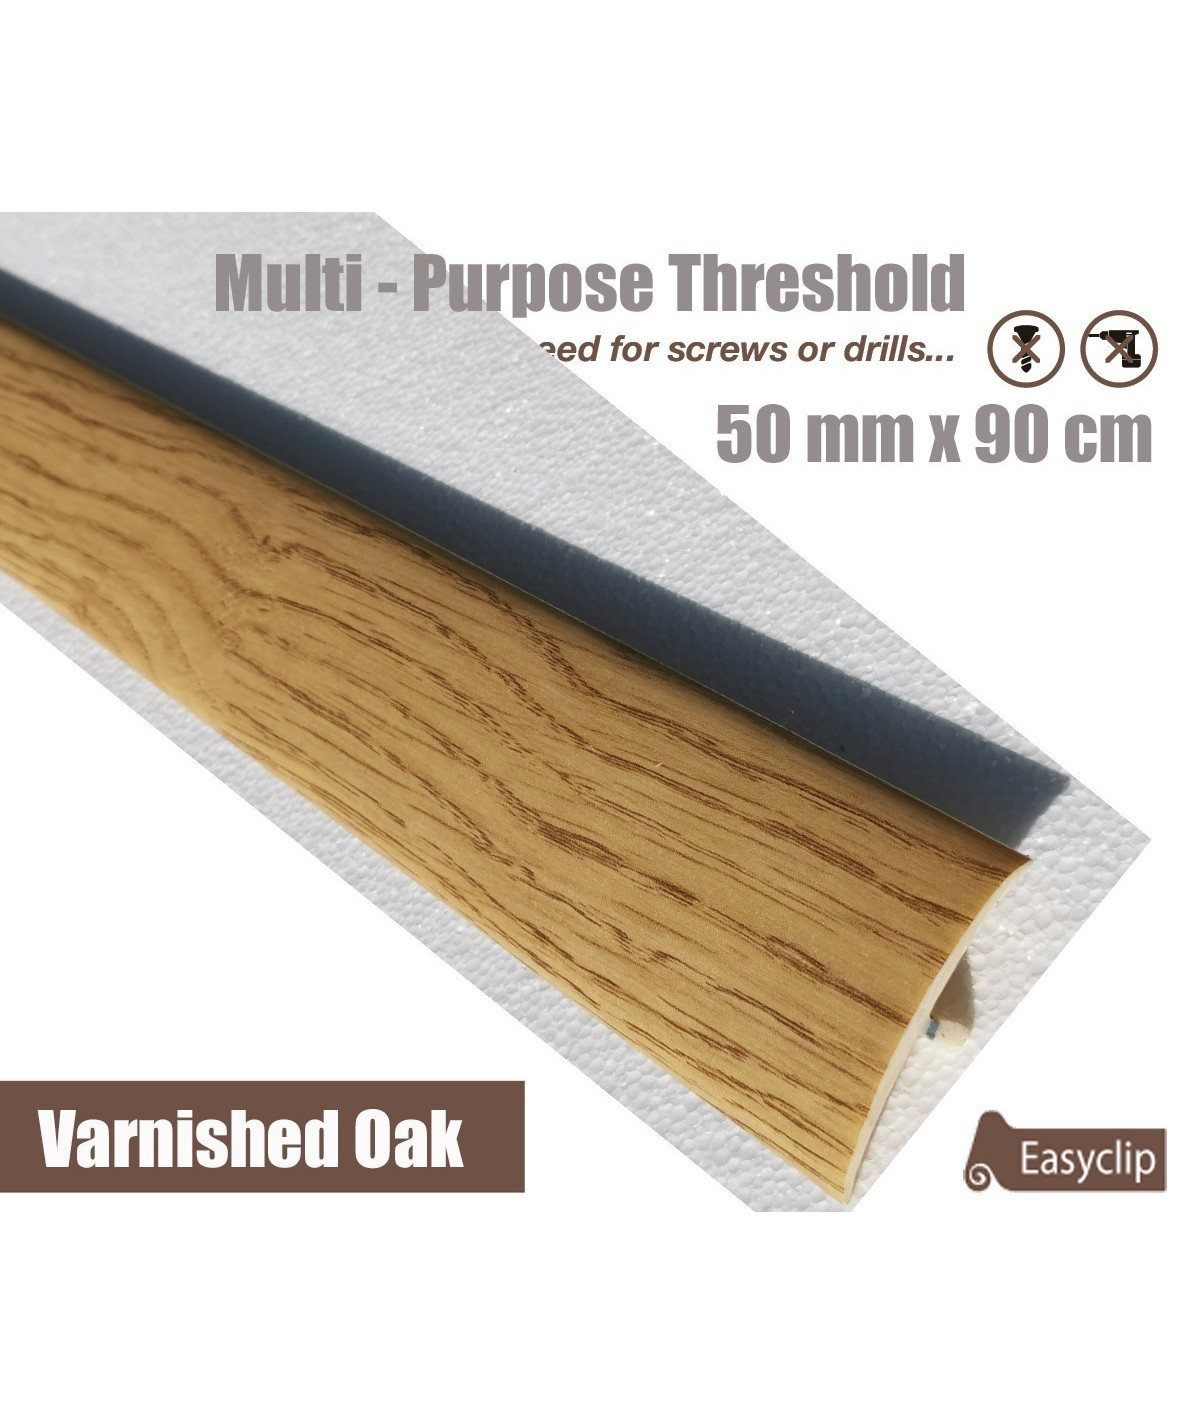 Varnished Oak Laminated Transition Threshold Strip  50mm x 90cm Multi-Height/Pivots